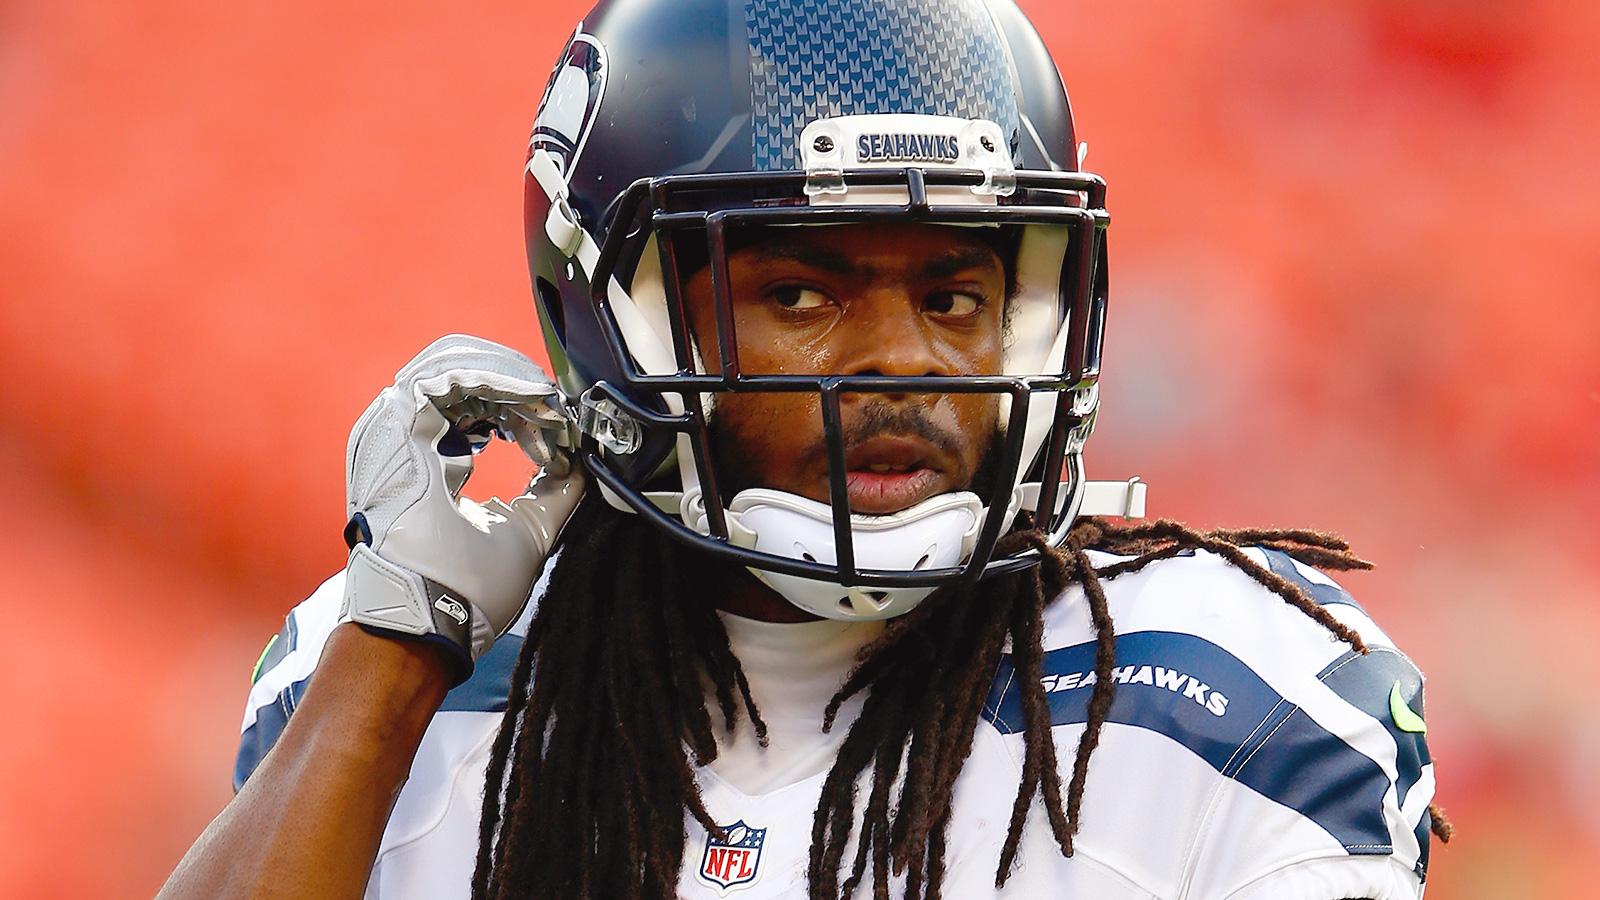 082415-NFL-Seahawks-Richard-Sherman-PI-CH